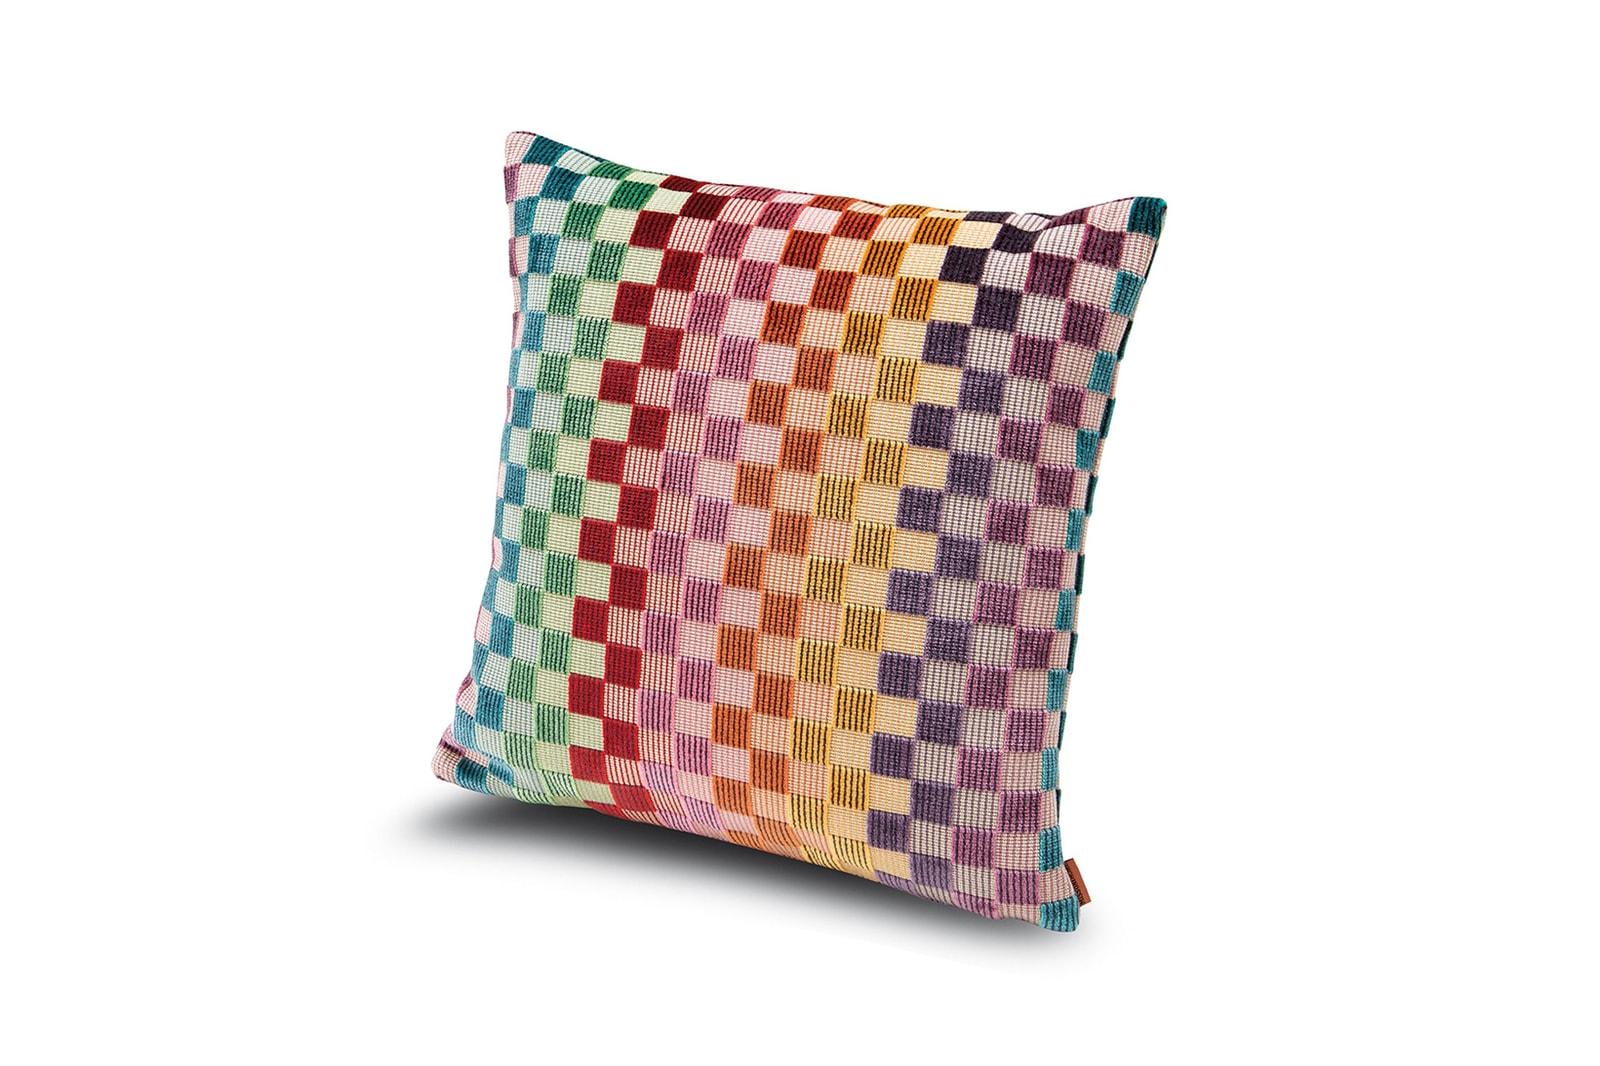 Throw Pillows Velvet Couch Home Decor Interior Design Living Room